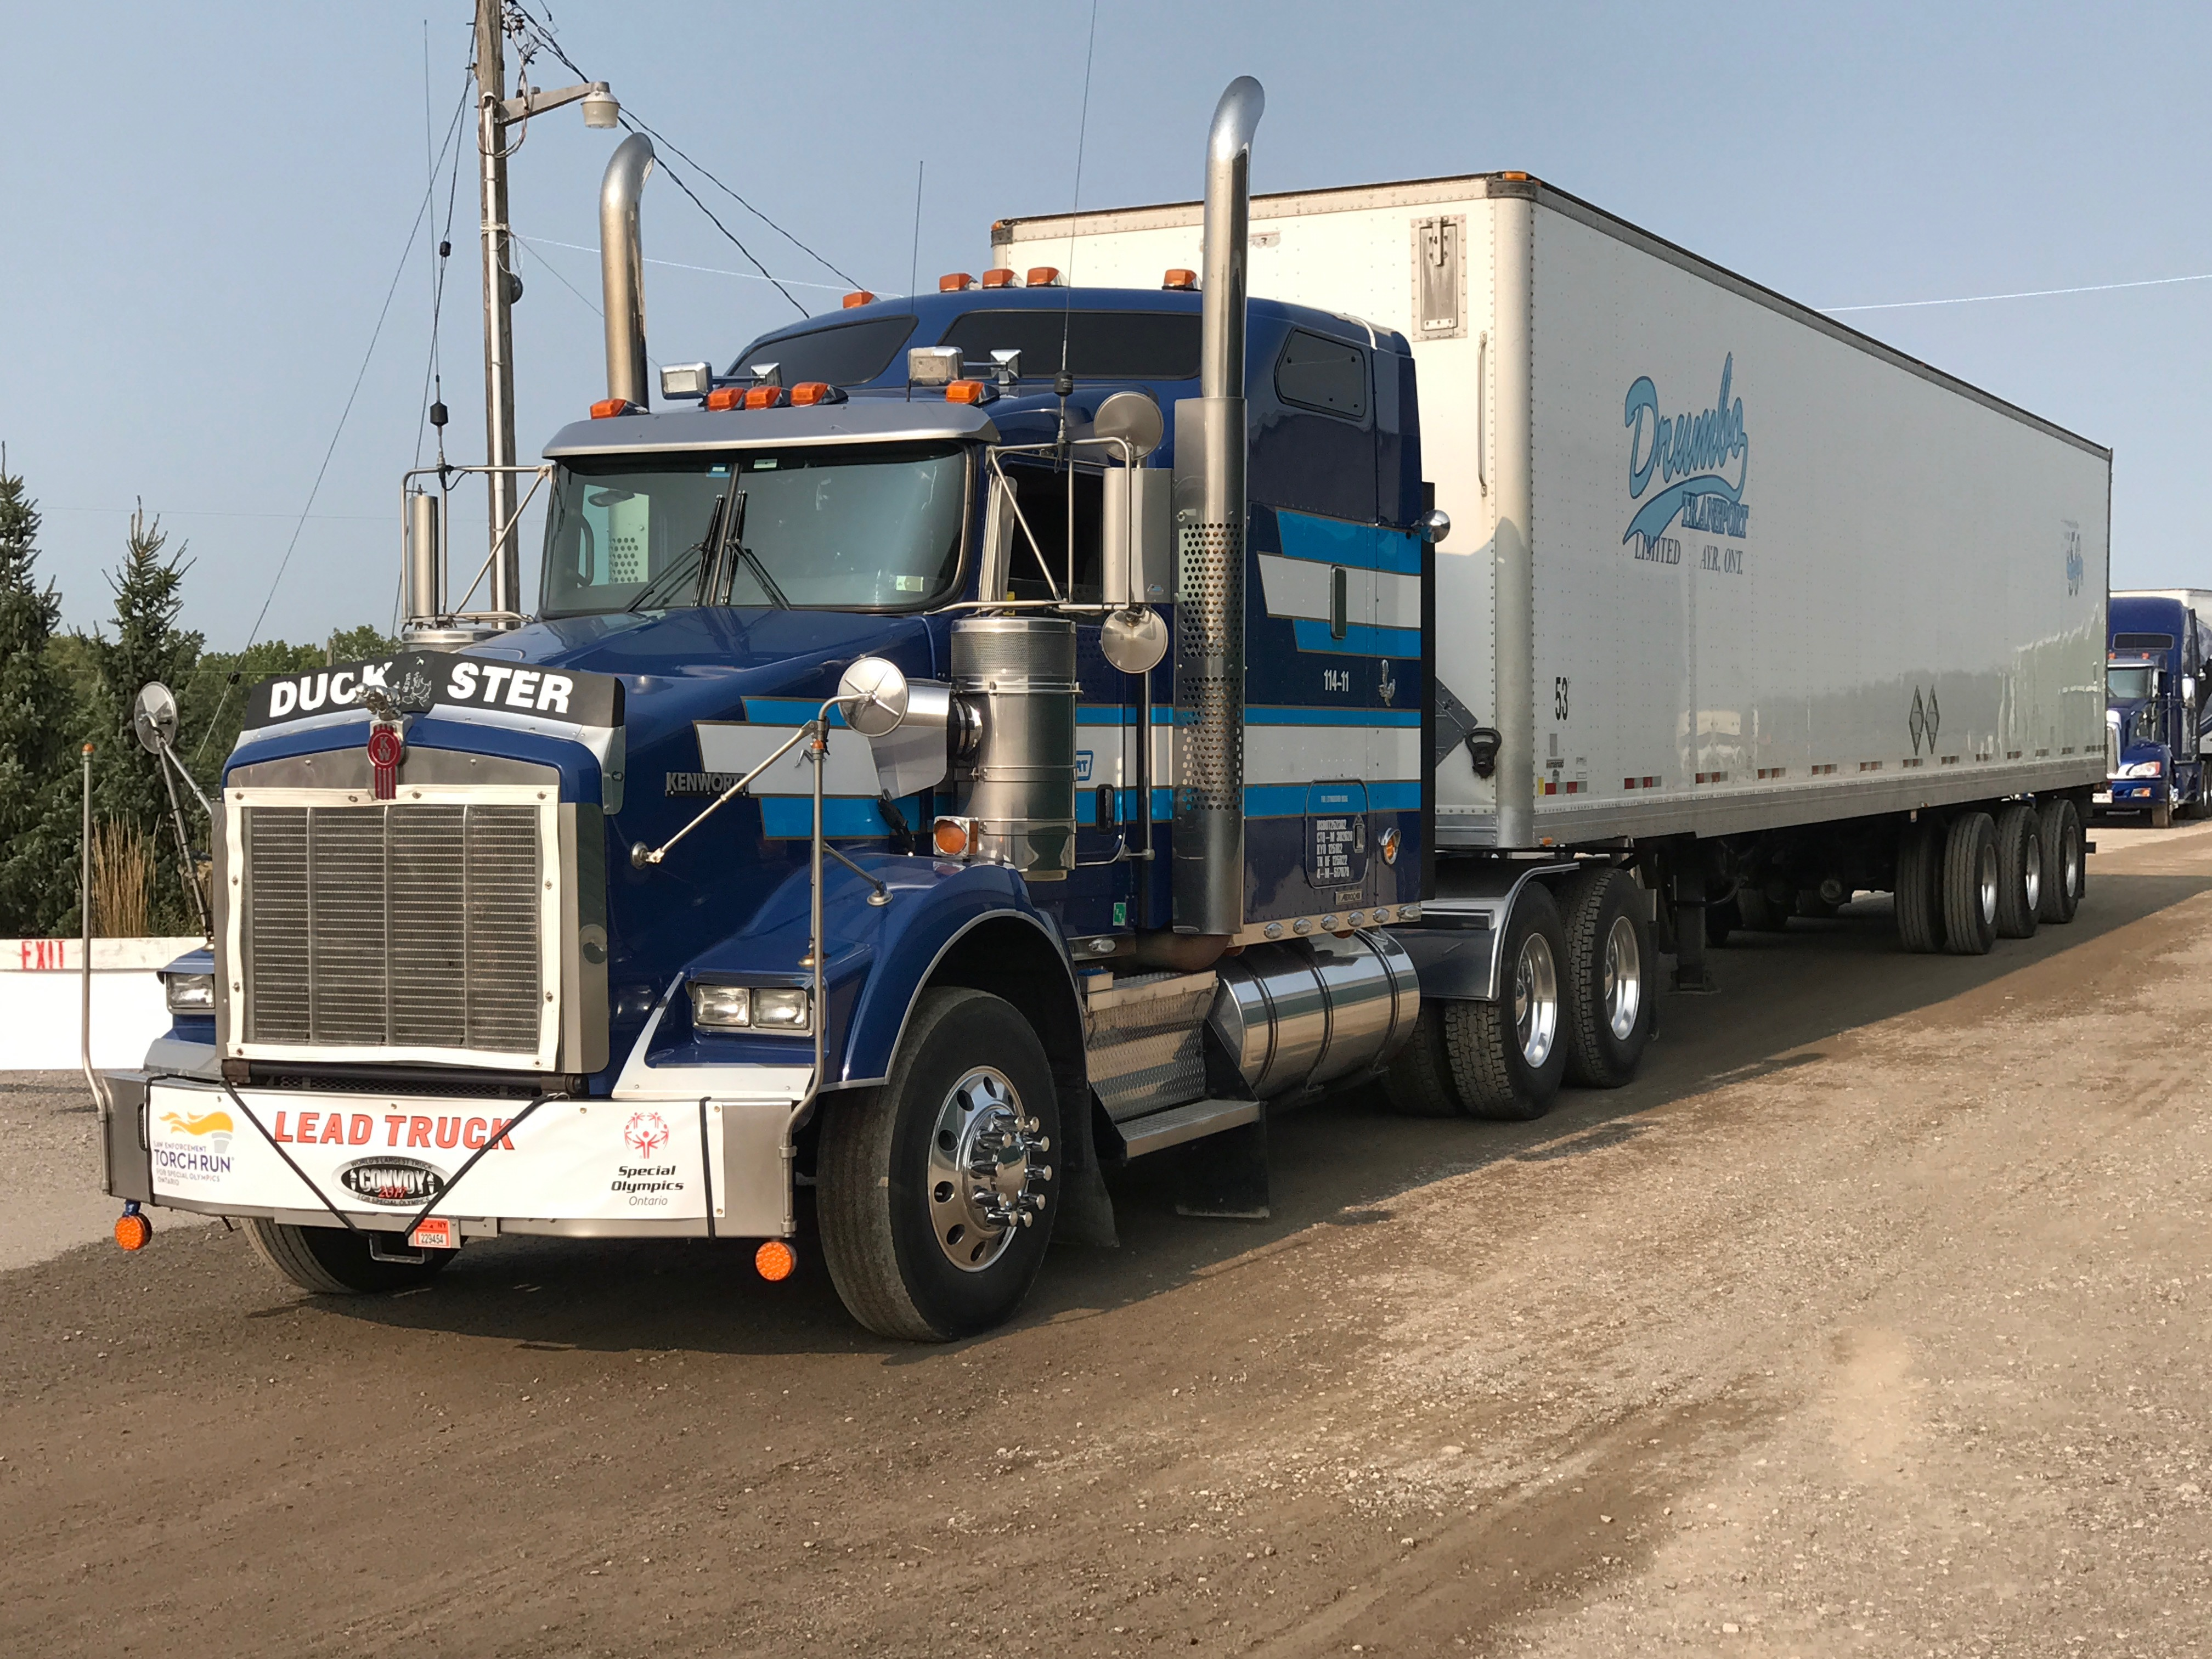 Lead Truck 2017-Duckster